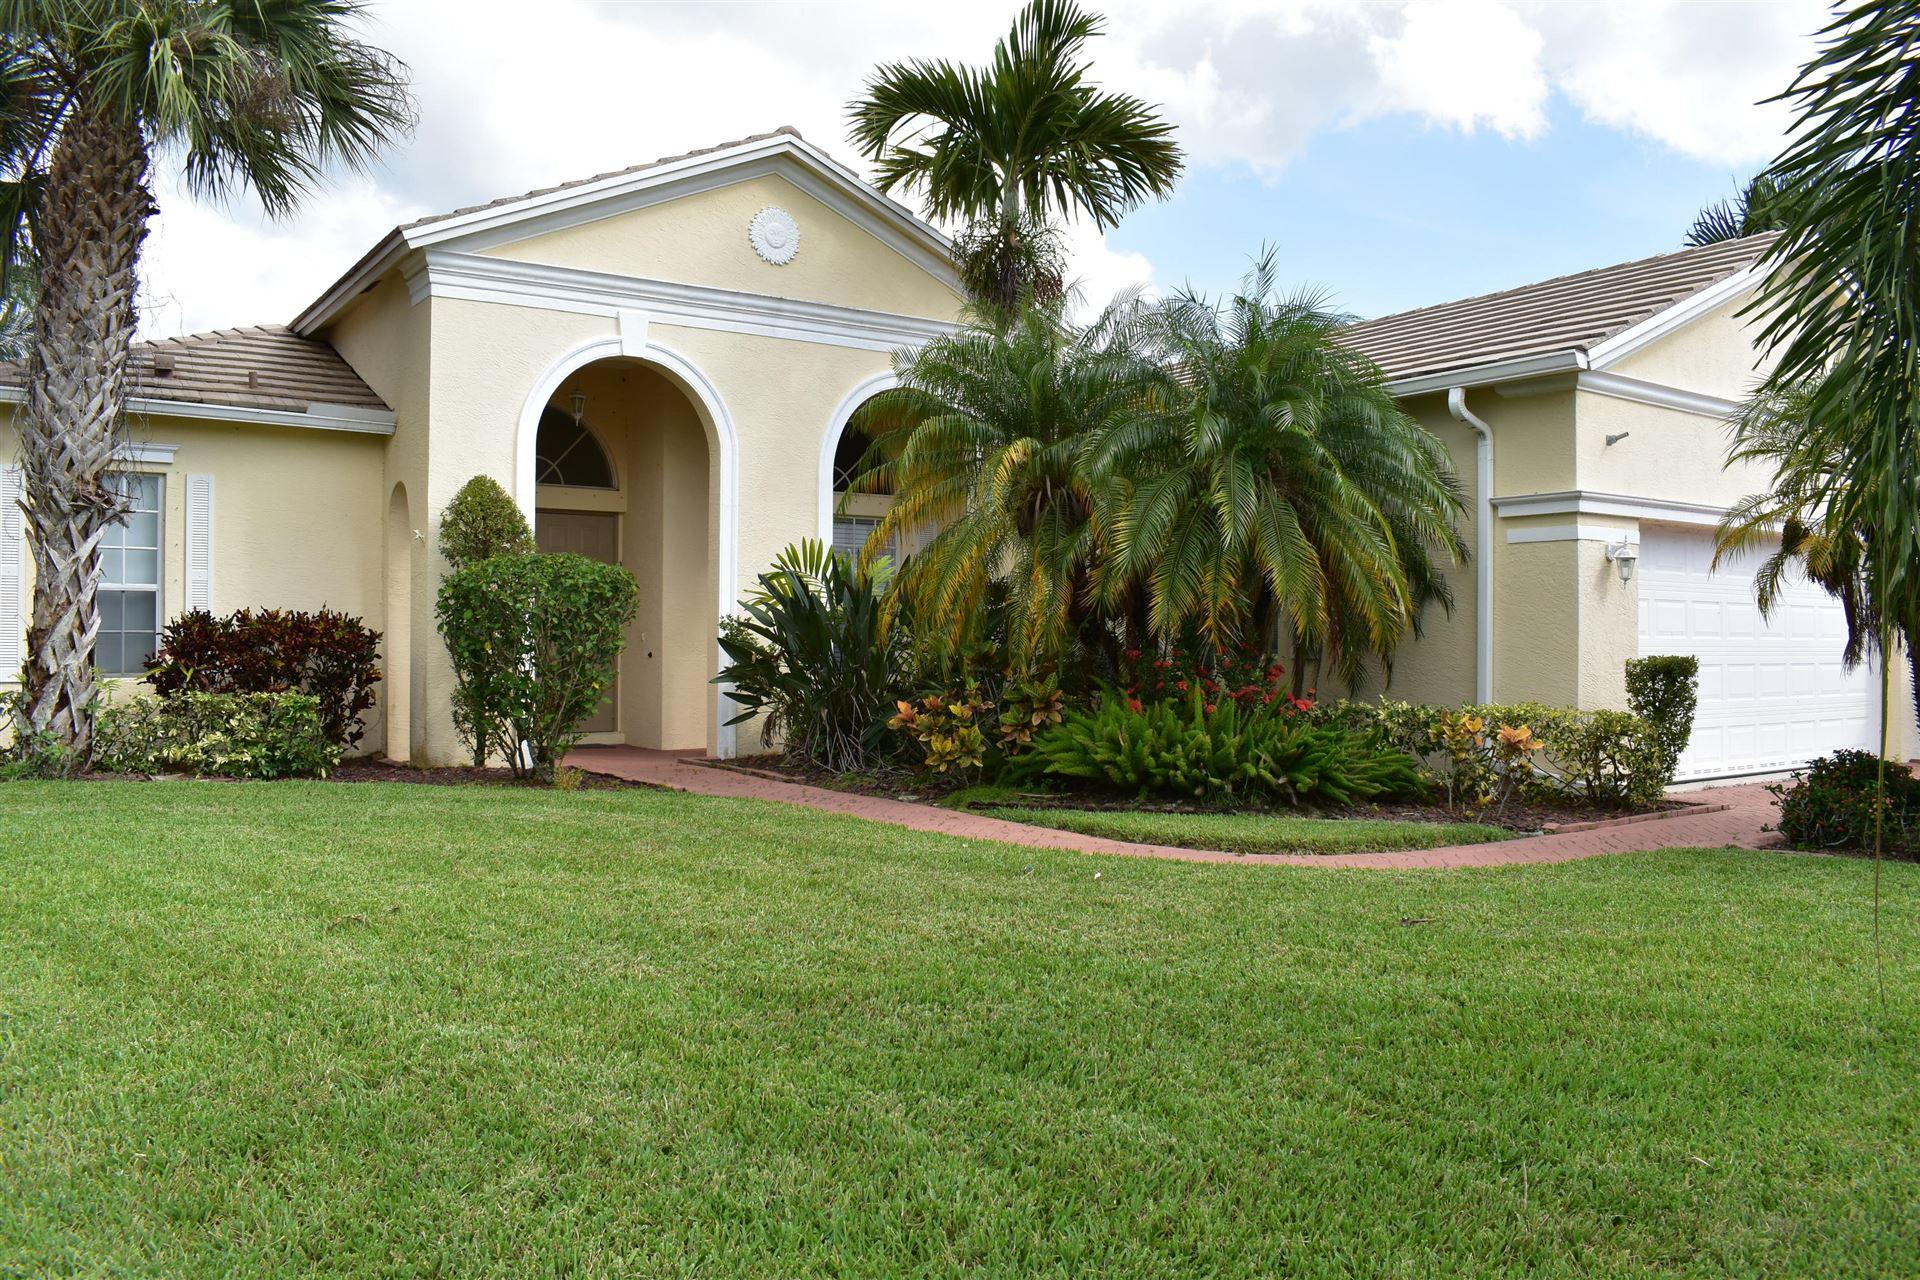 523 SW Lake Manatee Way, Port Saint Lucie, FL 34986 - MLS#: RX-10735556